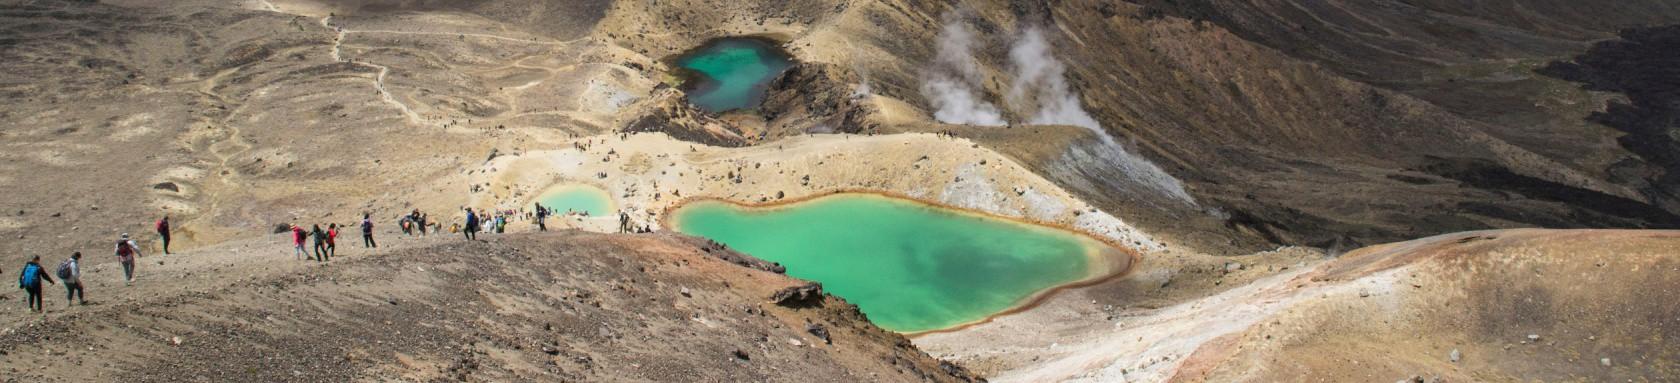 Crater lake water banner image